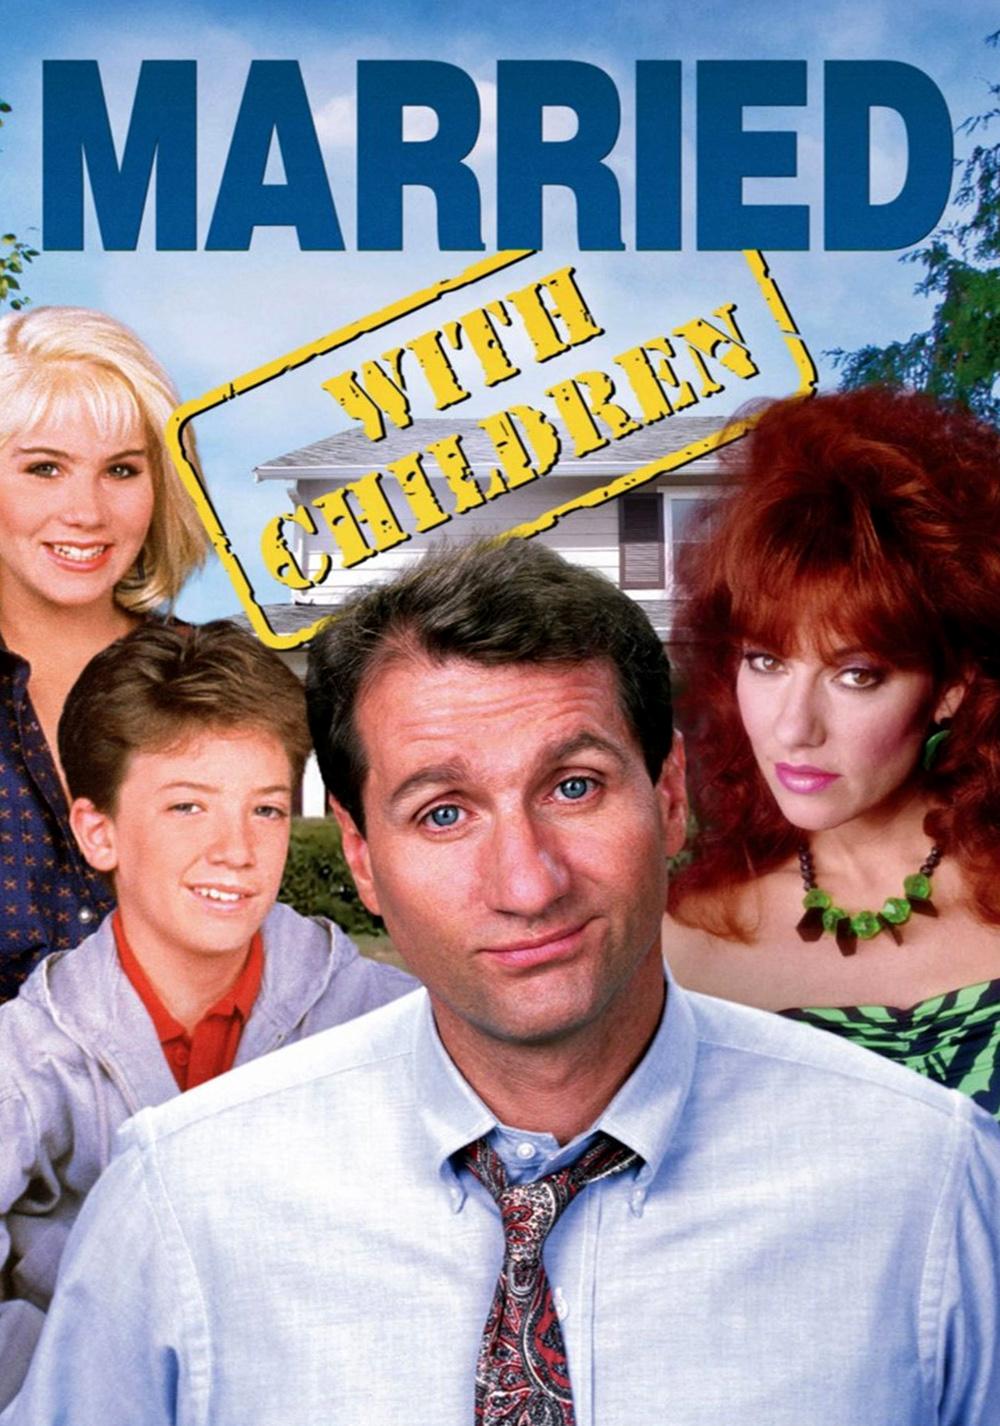 Married With Children: The 5 Best Episodes (& 5 Worst)